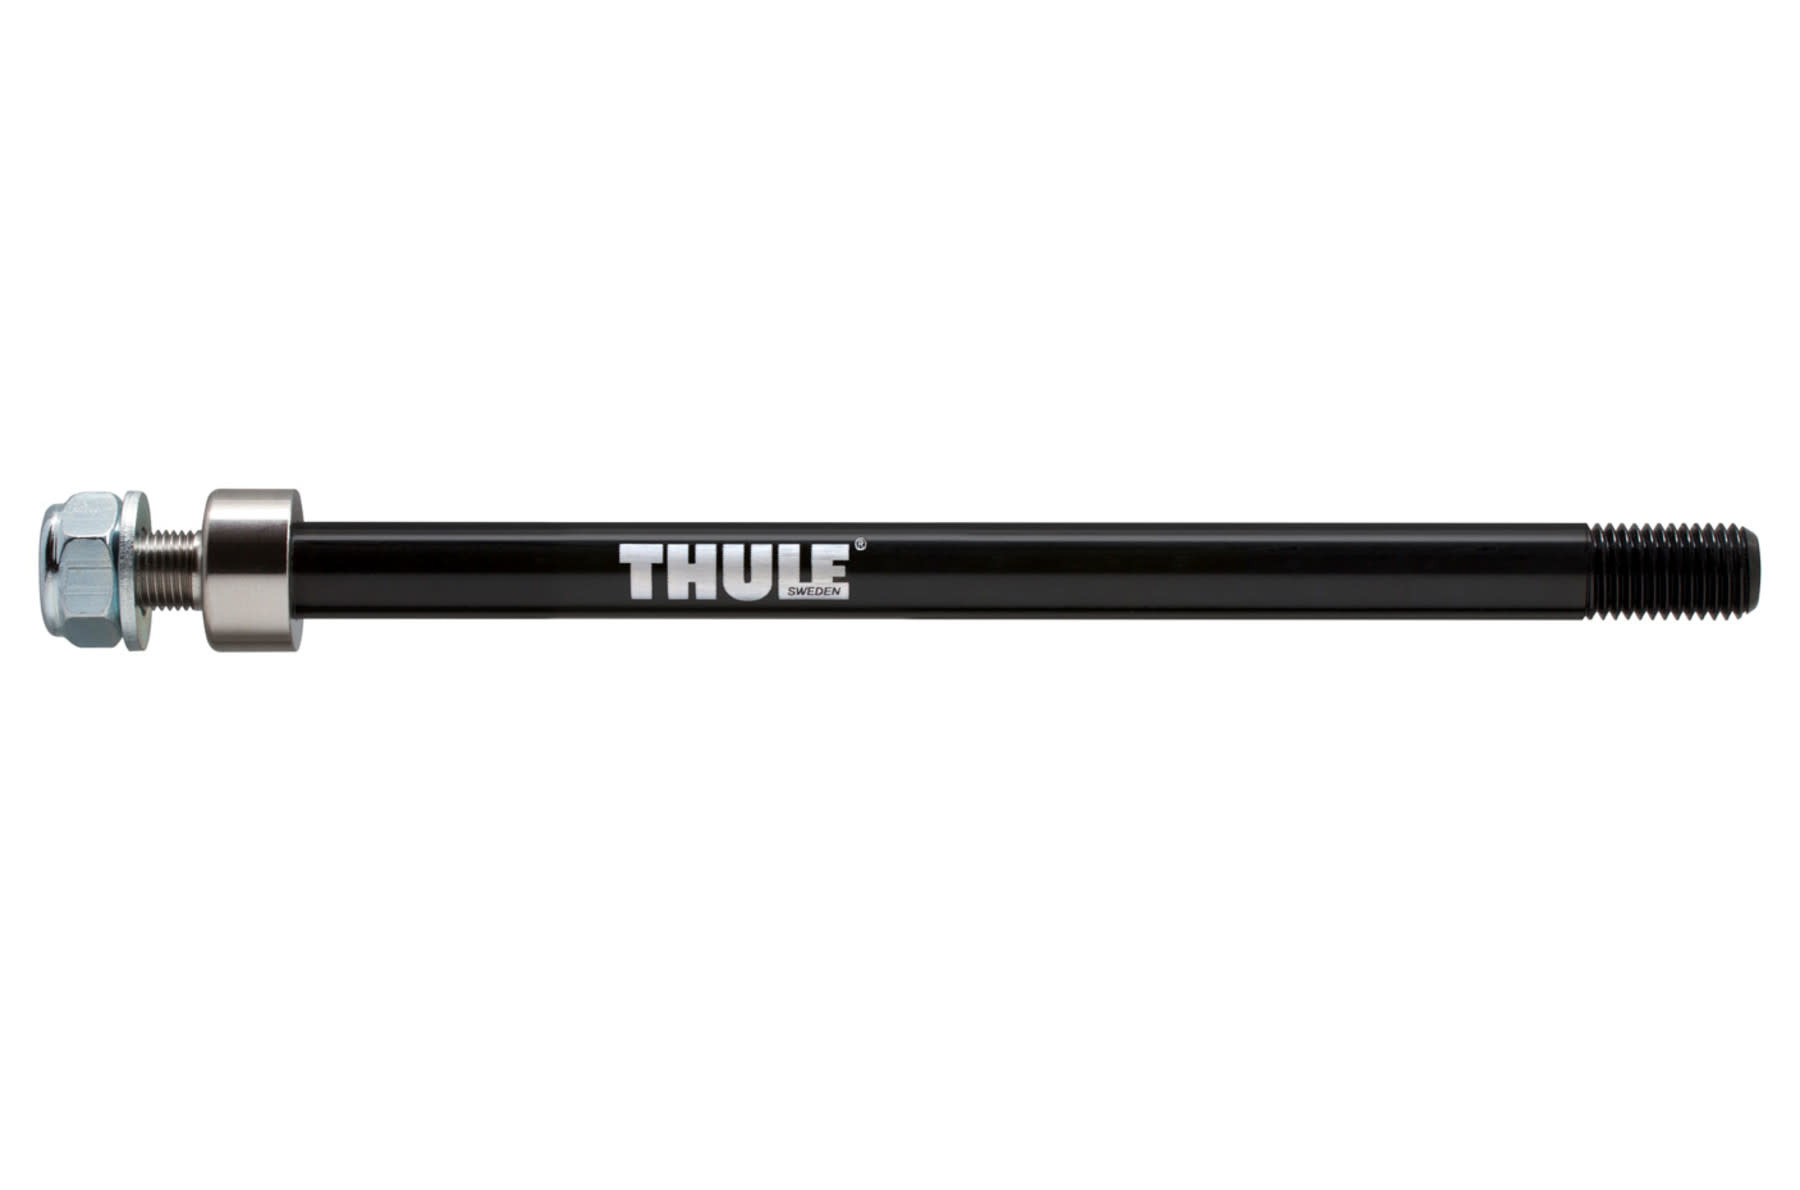 Axe Thule Thru Axle 172 Or 178mm (M12X1.5) - Shimano Noir